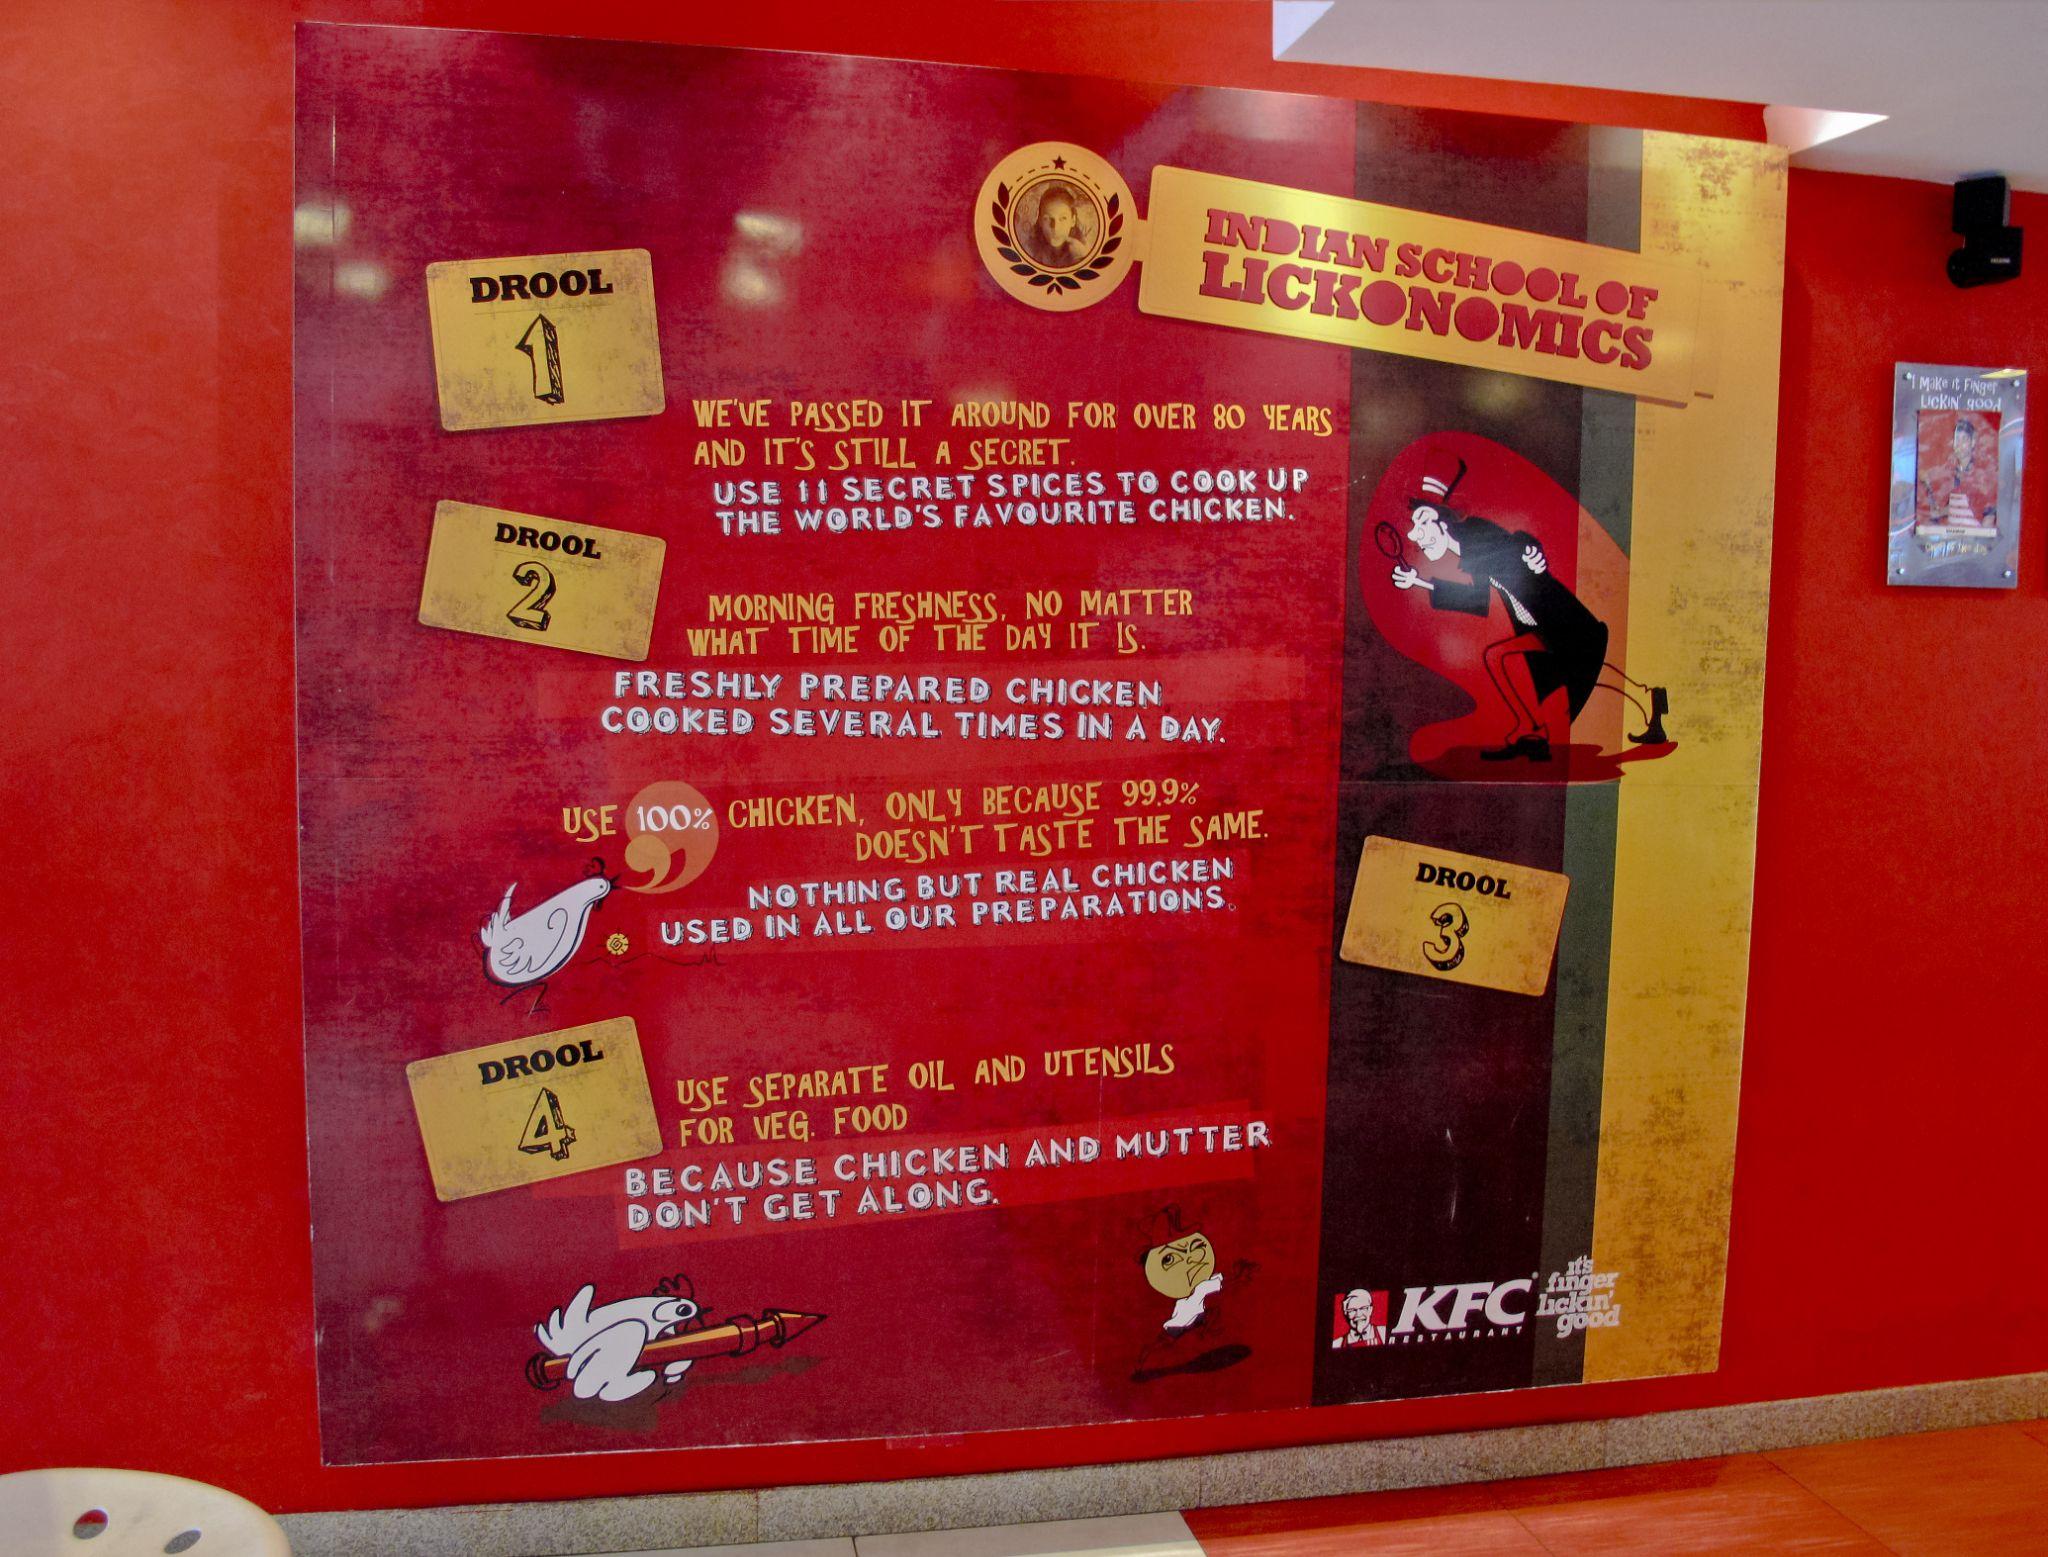 kfc's indian school of lickonomics by Victor Kam